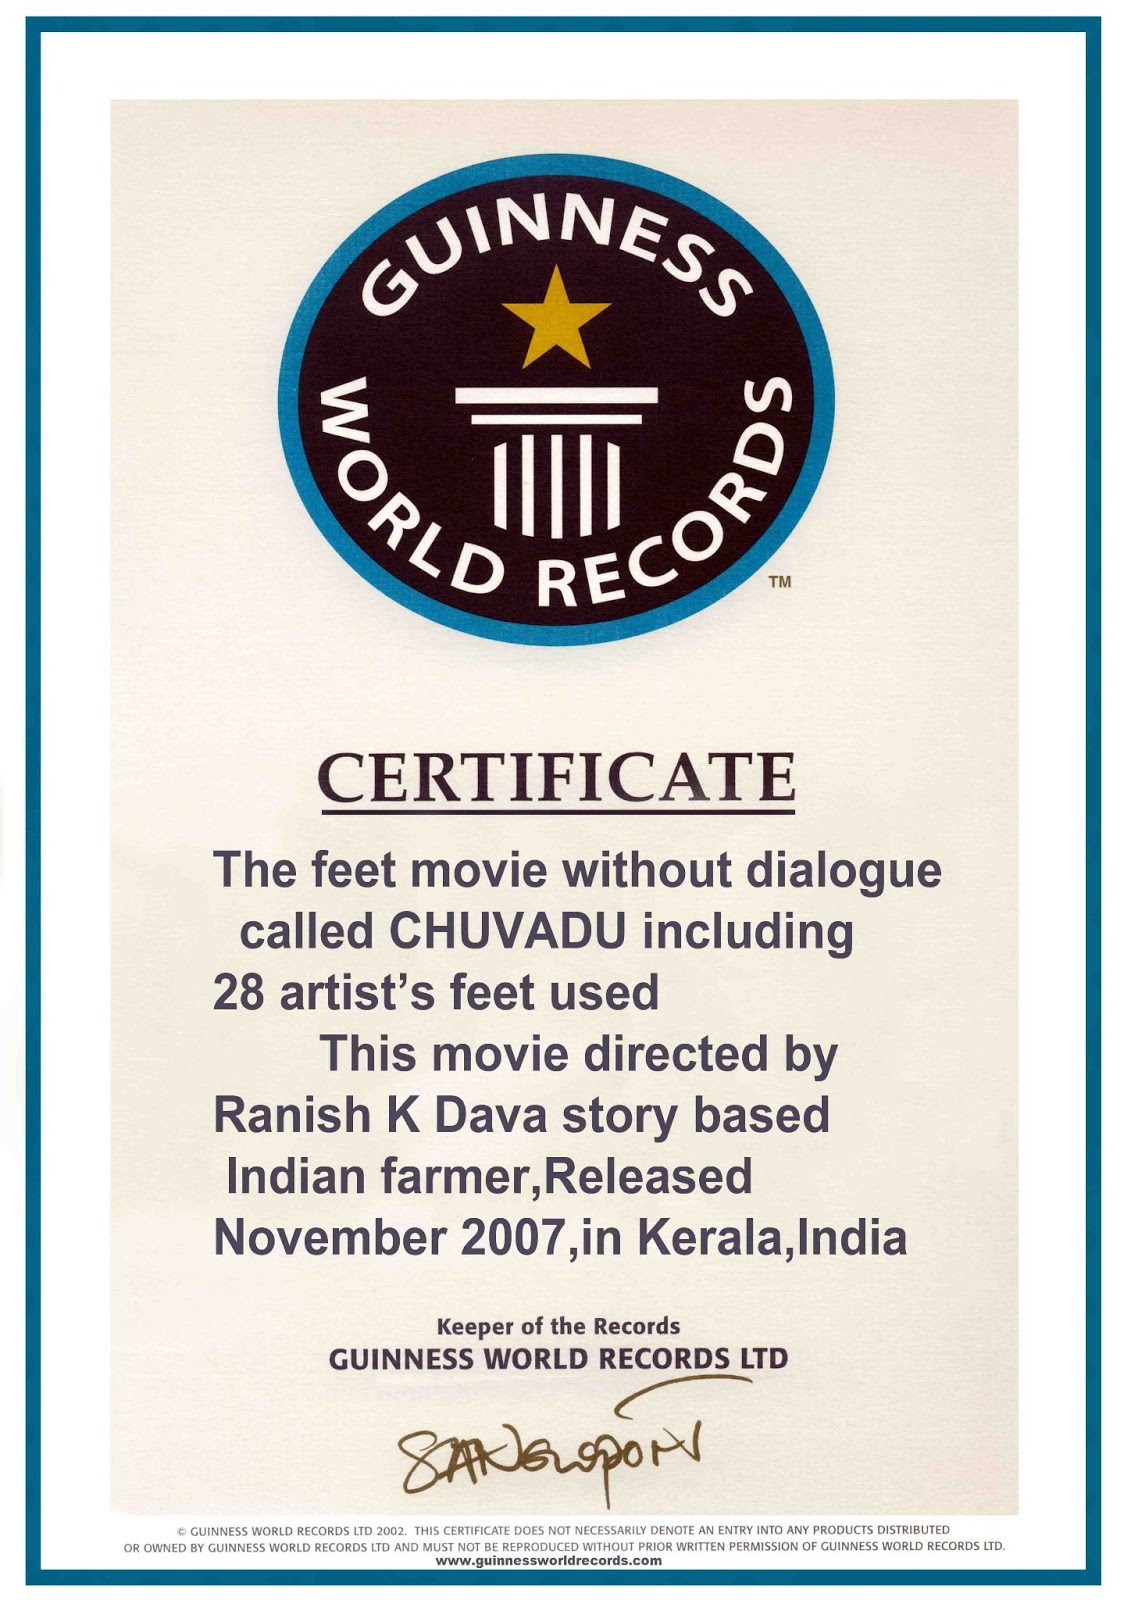 Guinness World Record Certificate Template Professional Mandegarfo